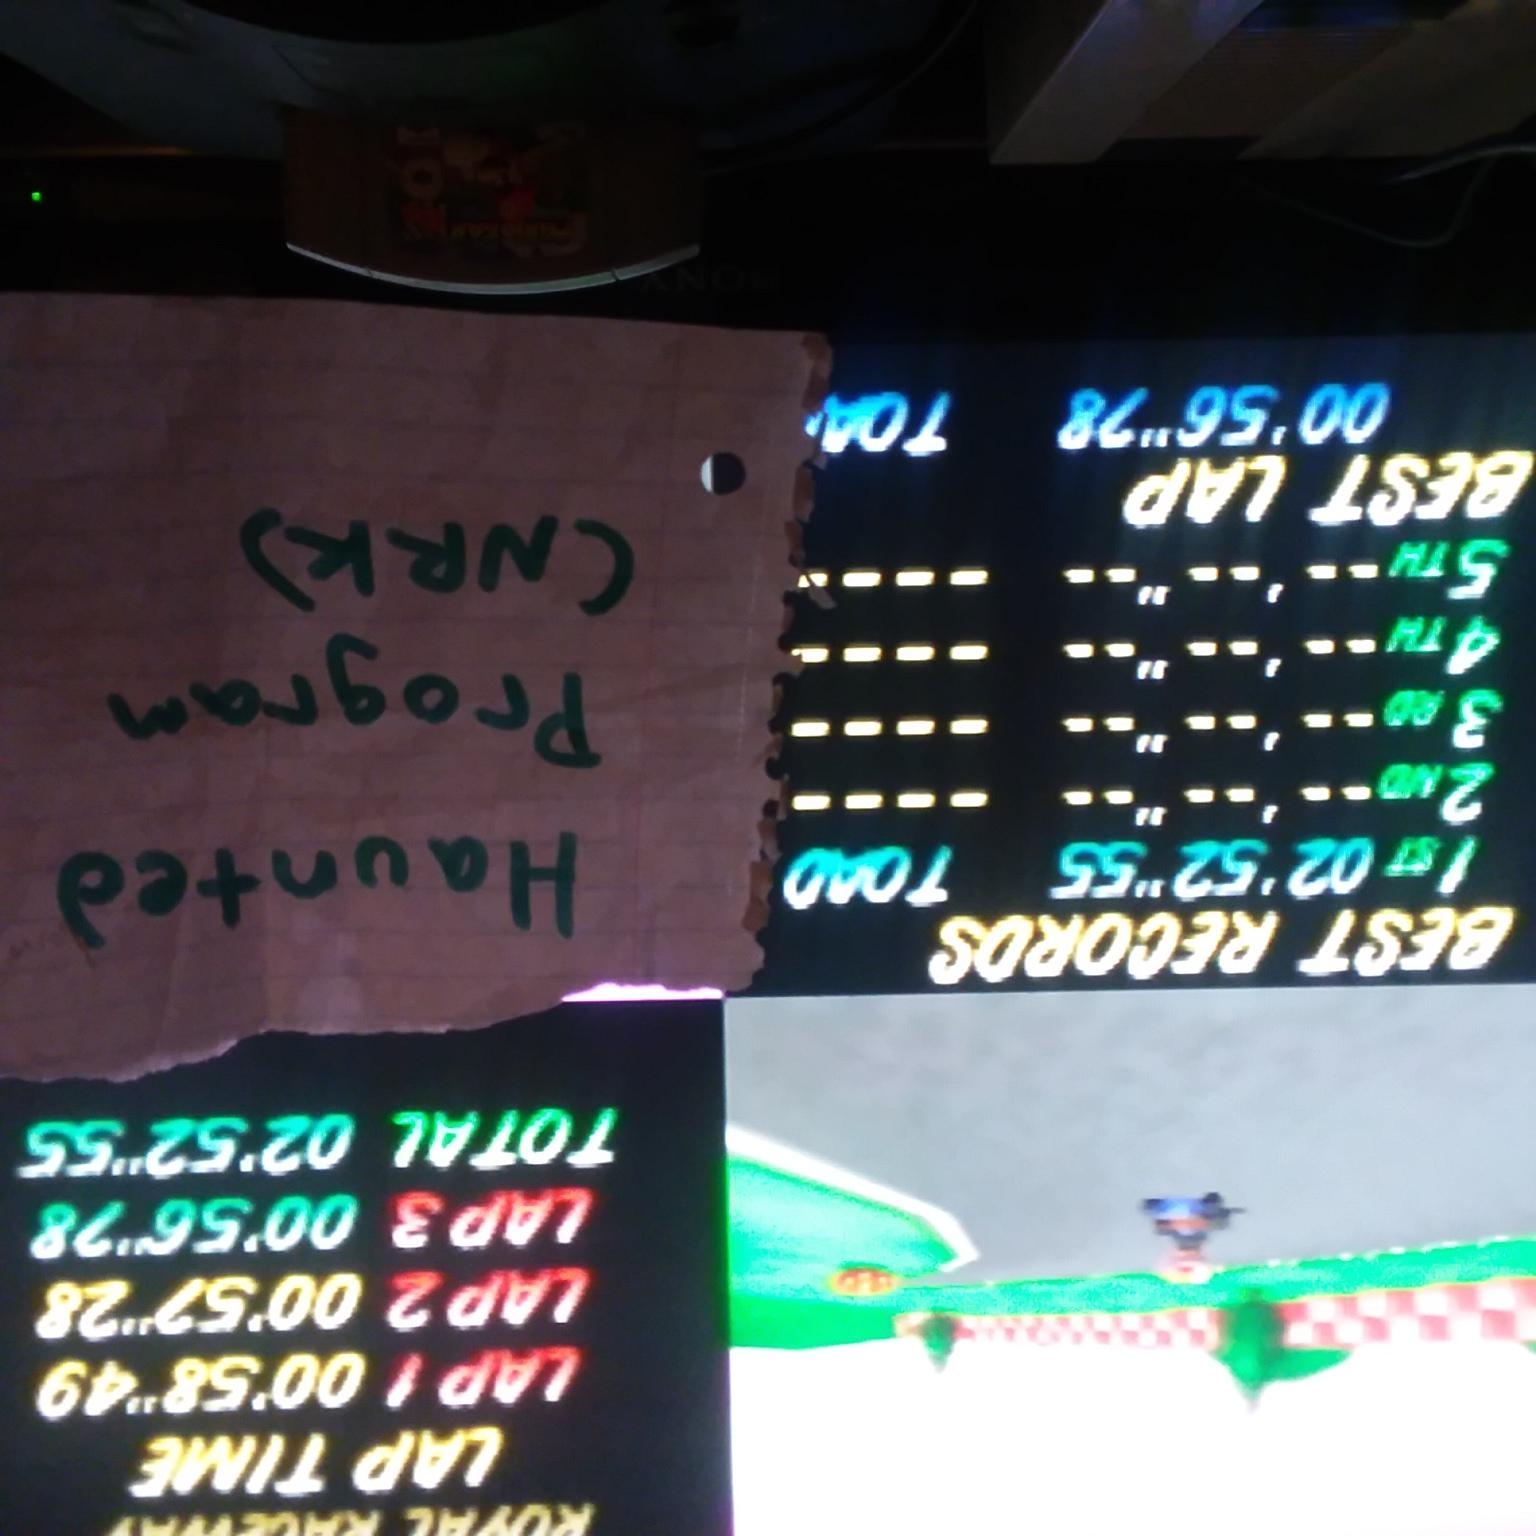 Mario Kart 64: Royal Raceway [Time Trial] time of 0:02:52.55